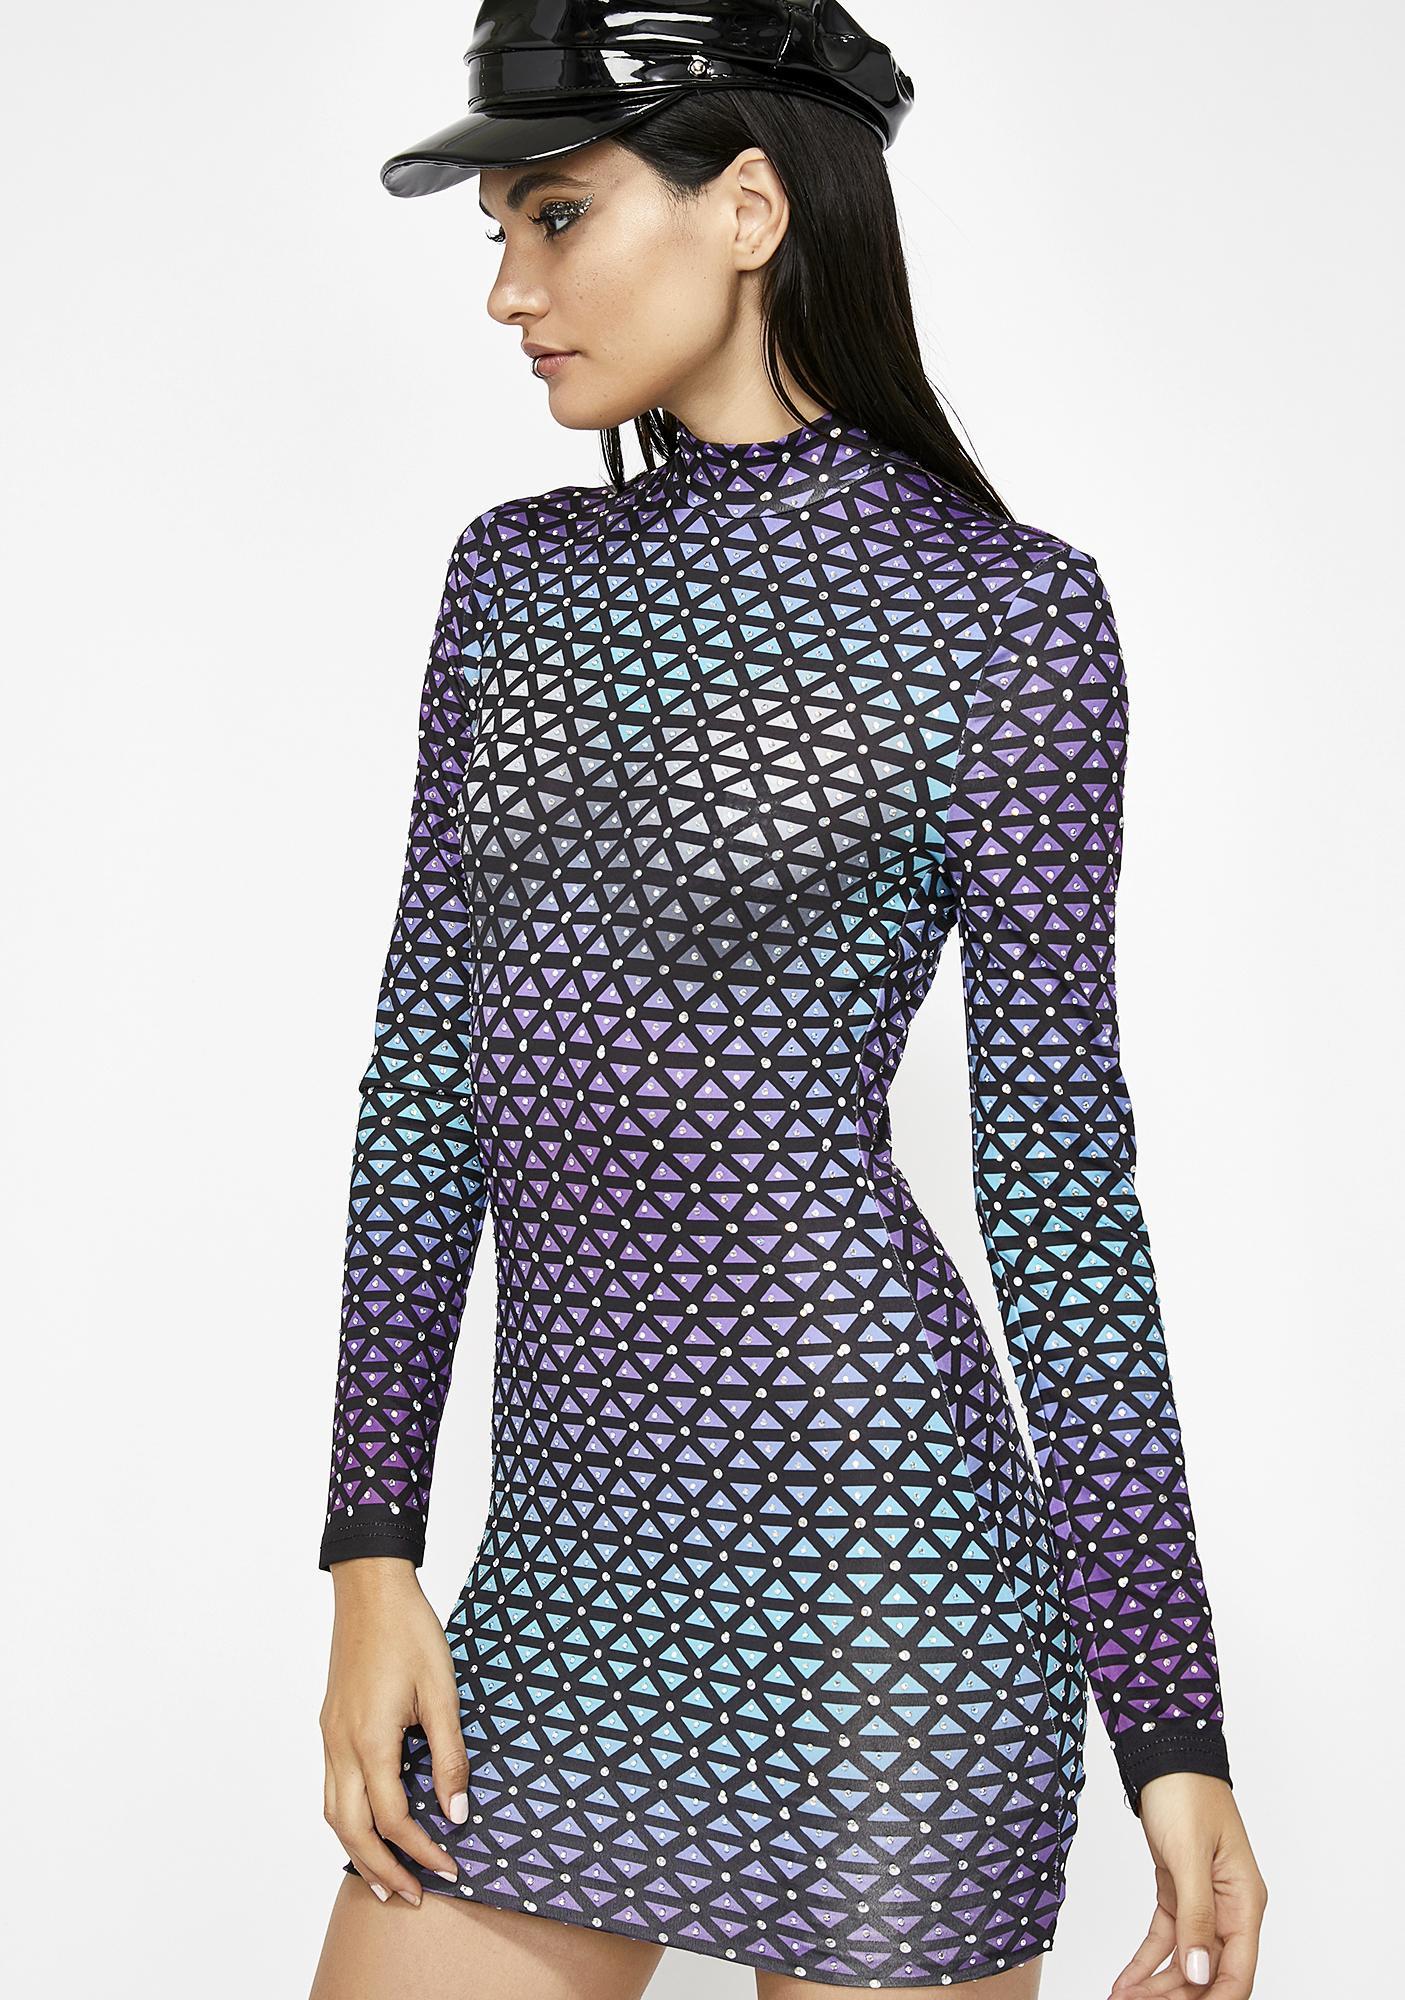 2019 year looks- Night to Class Out: Geometric Print Dress